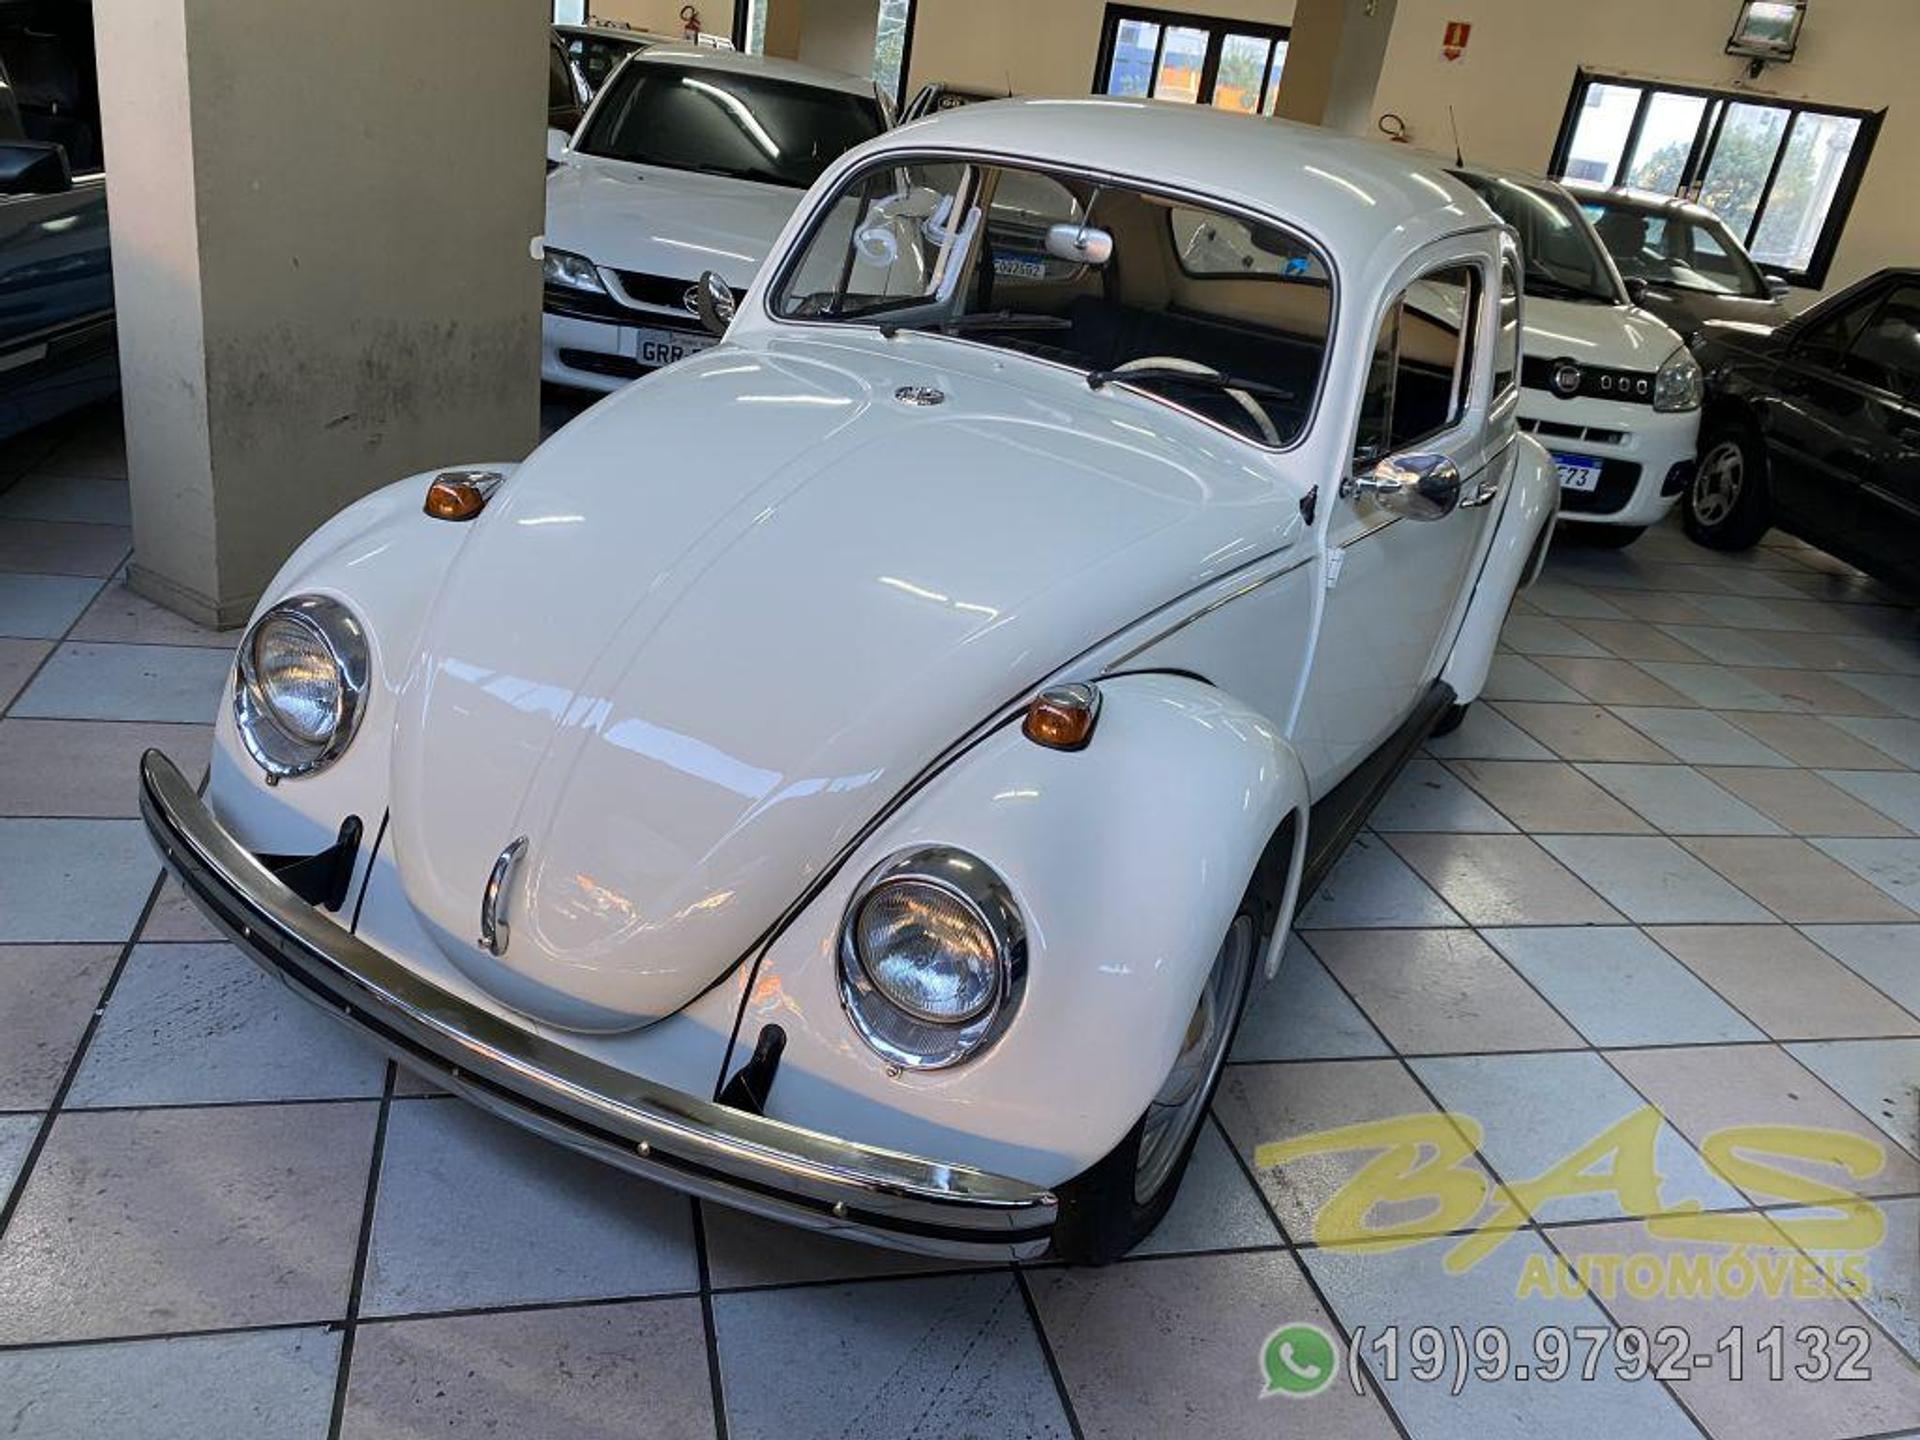 Volkswagen Fusca 1.2 8v Gasolina 2p Manual carros usados